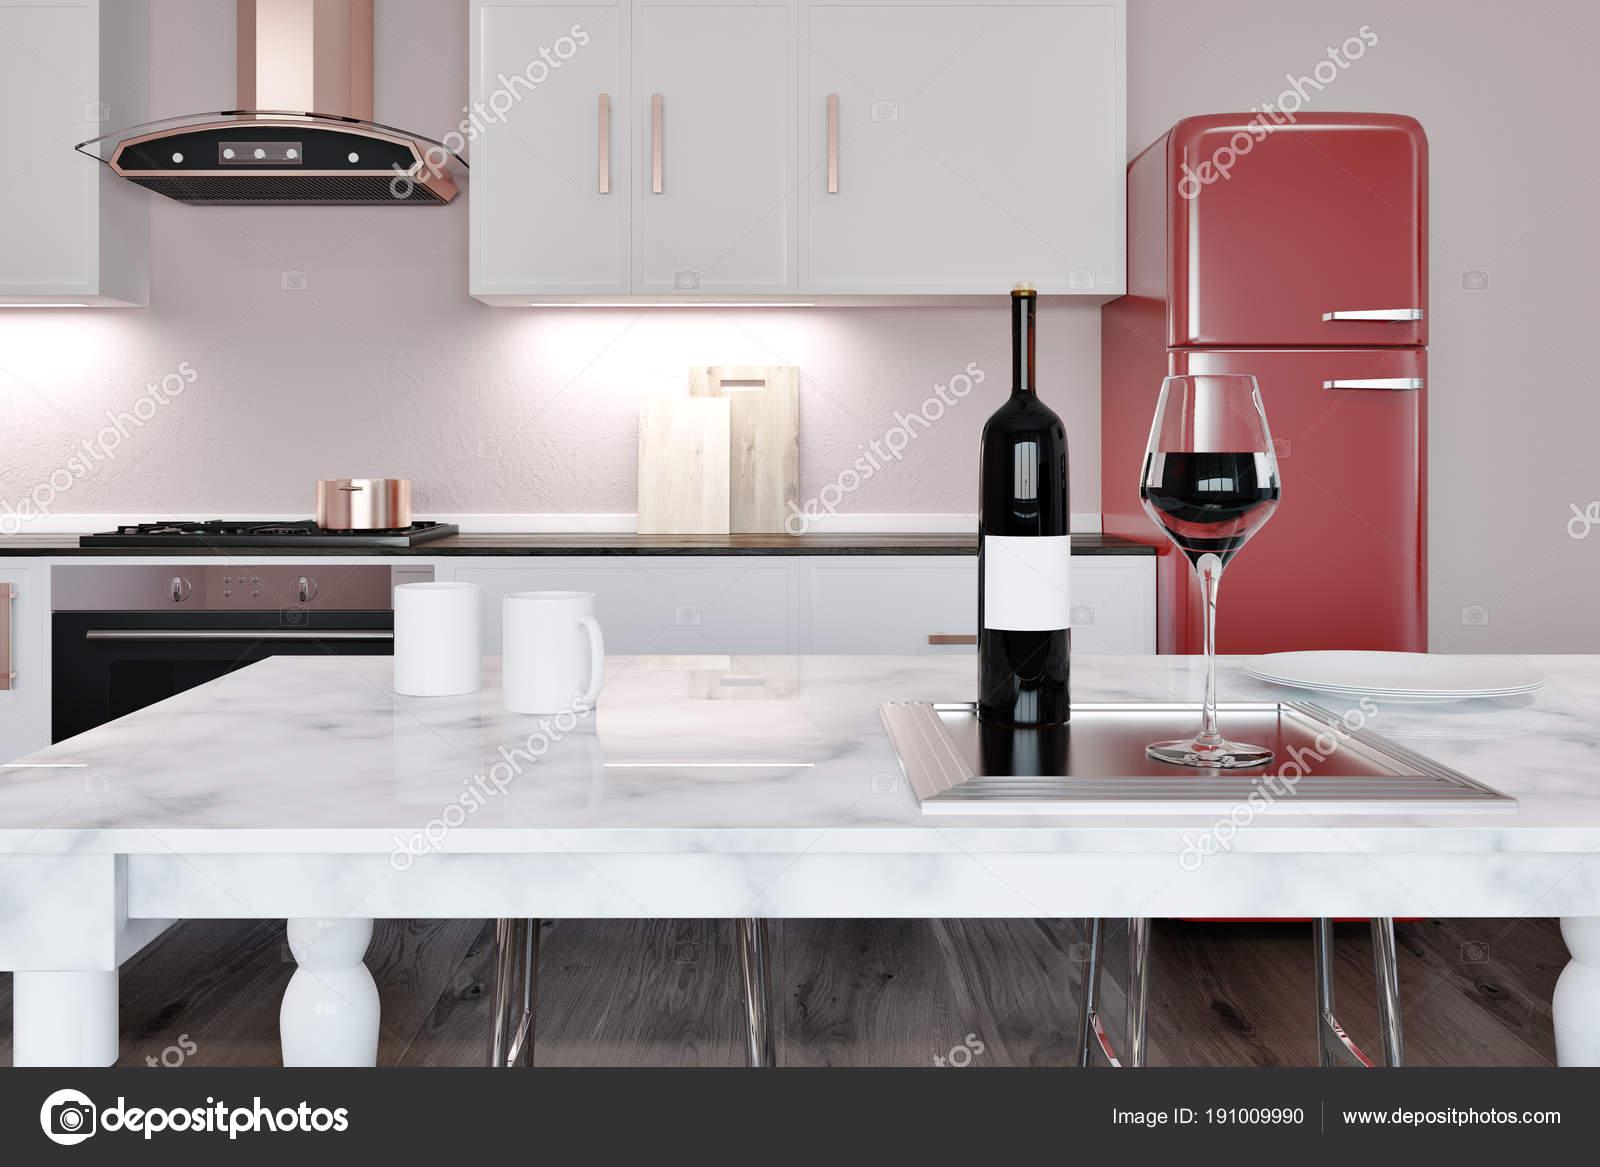 White marble kitchen island red fridge stock photo